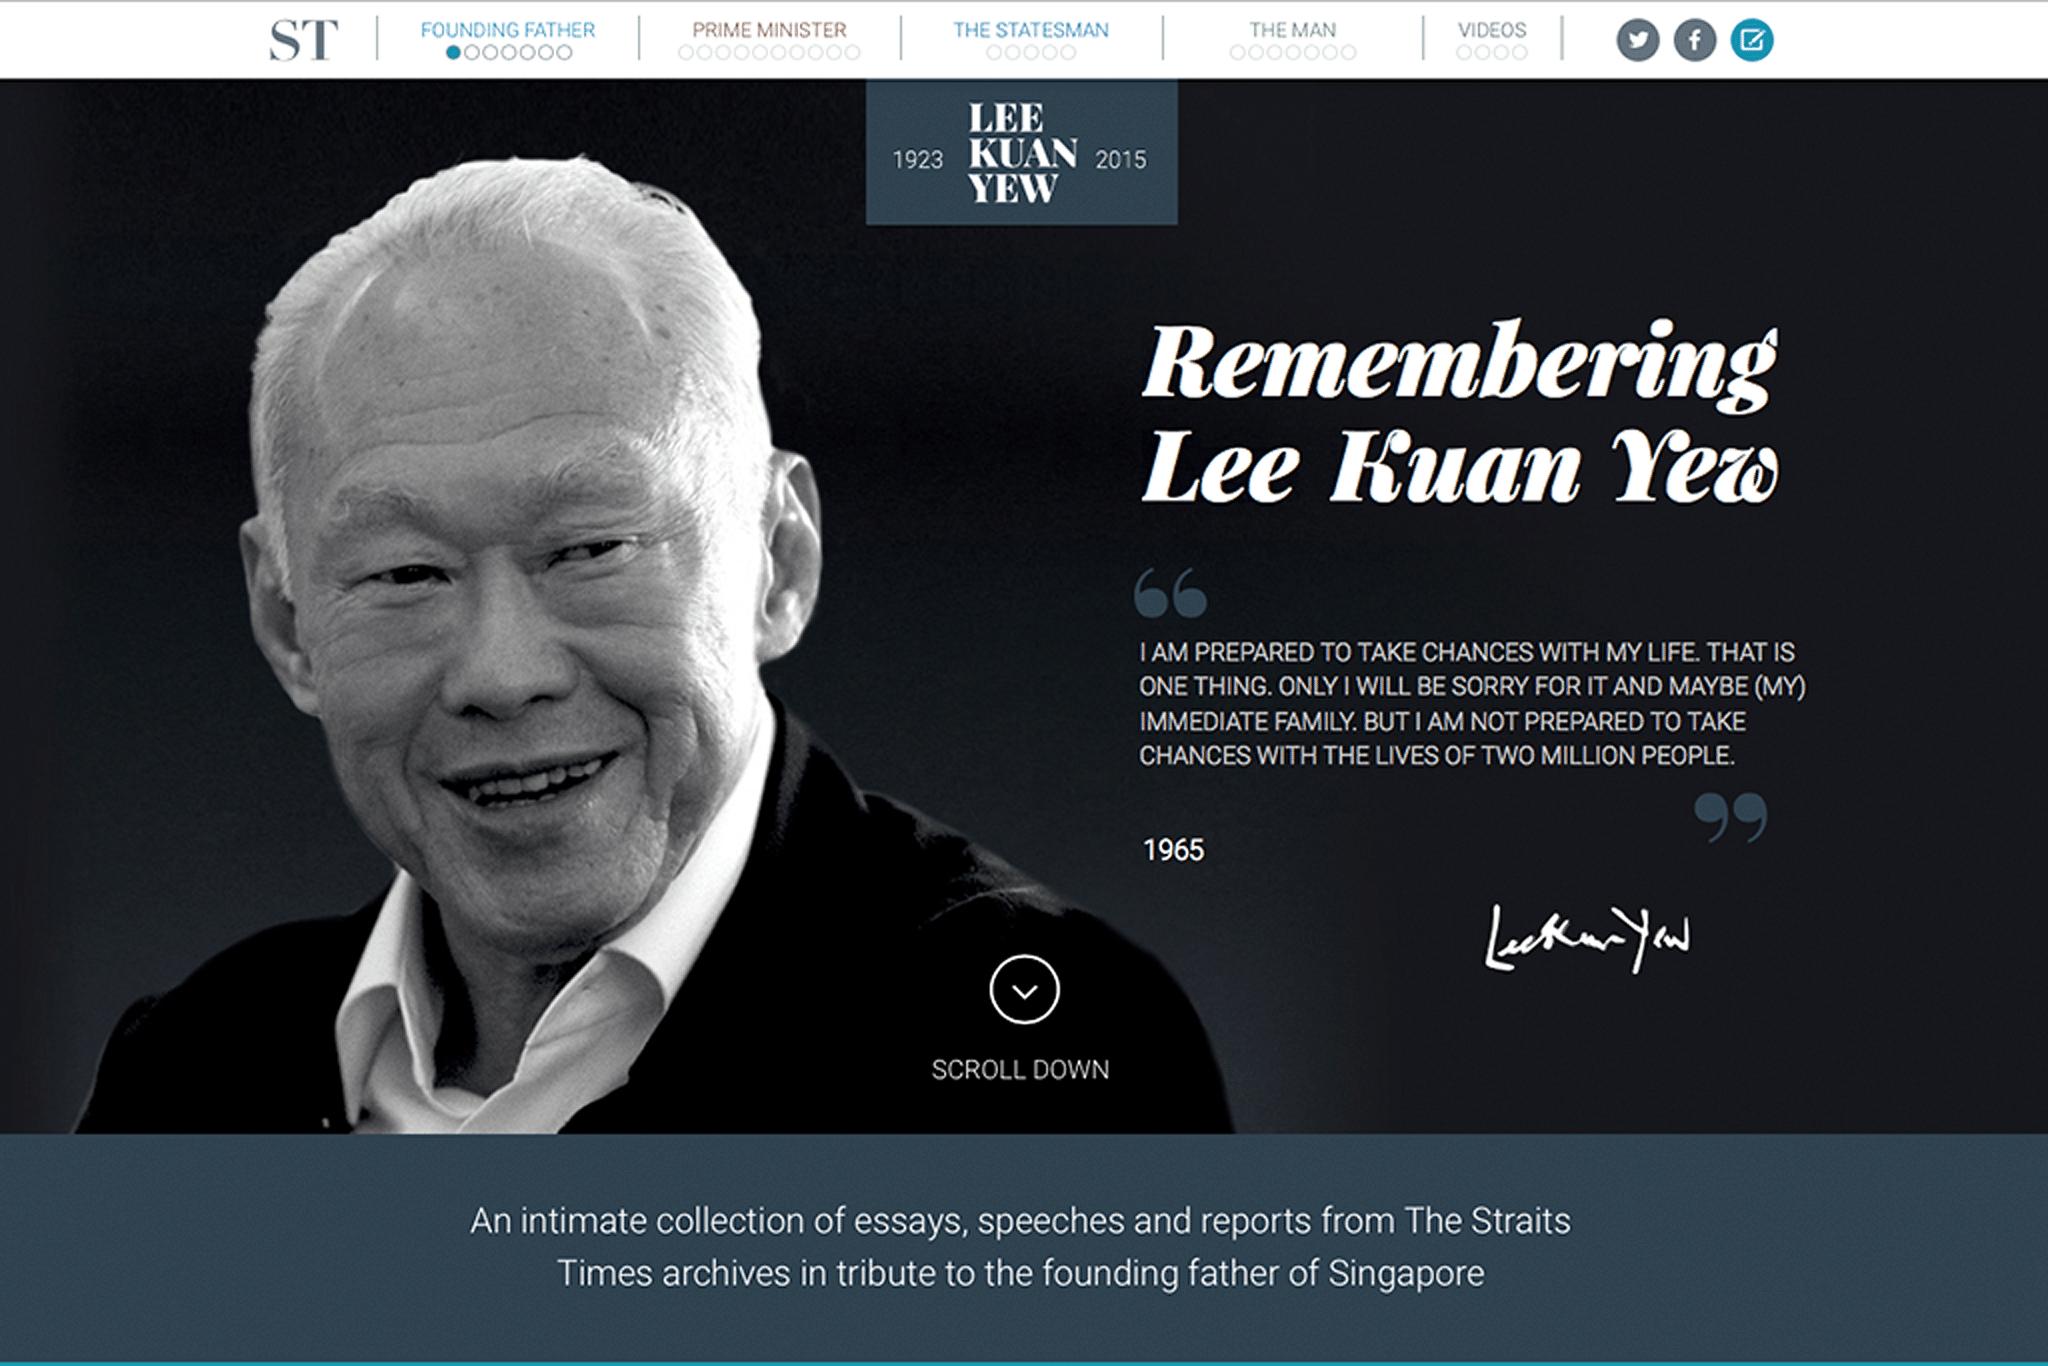 Remembering Lee Kuan Yew, microsite